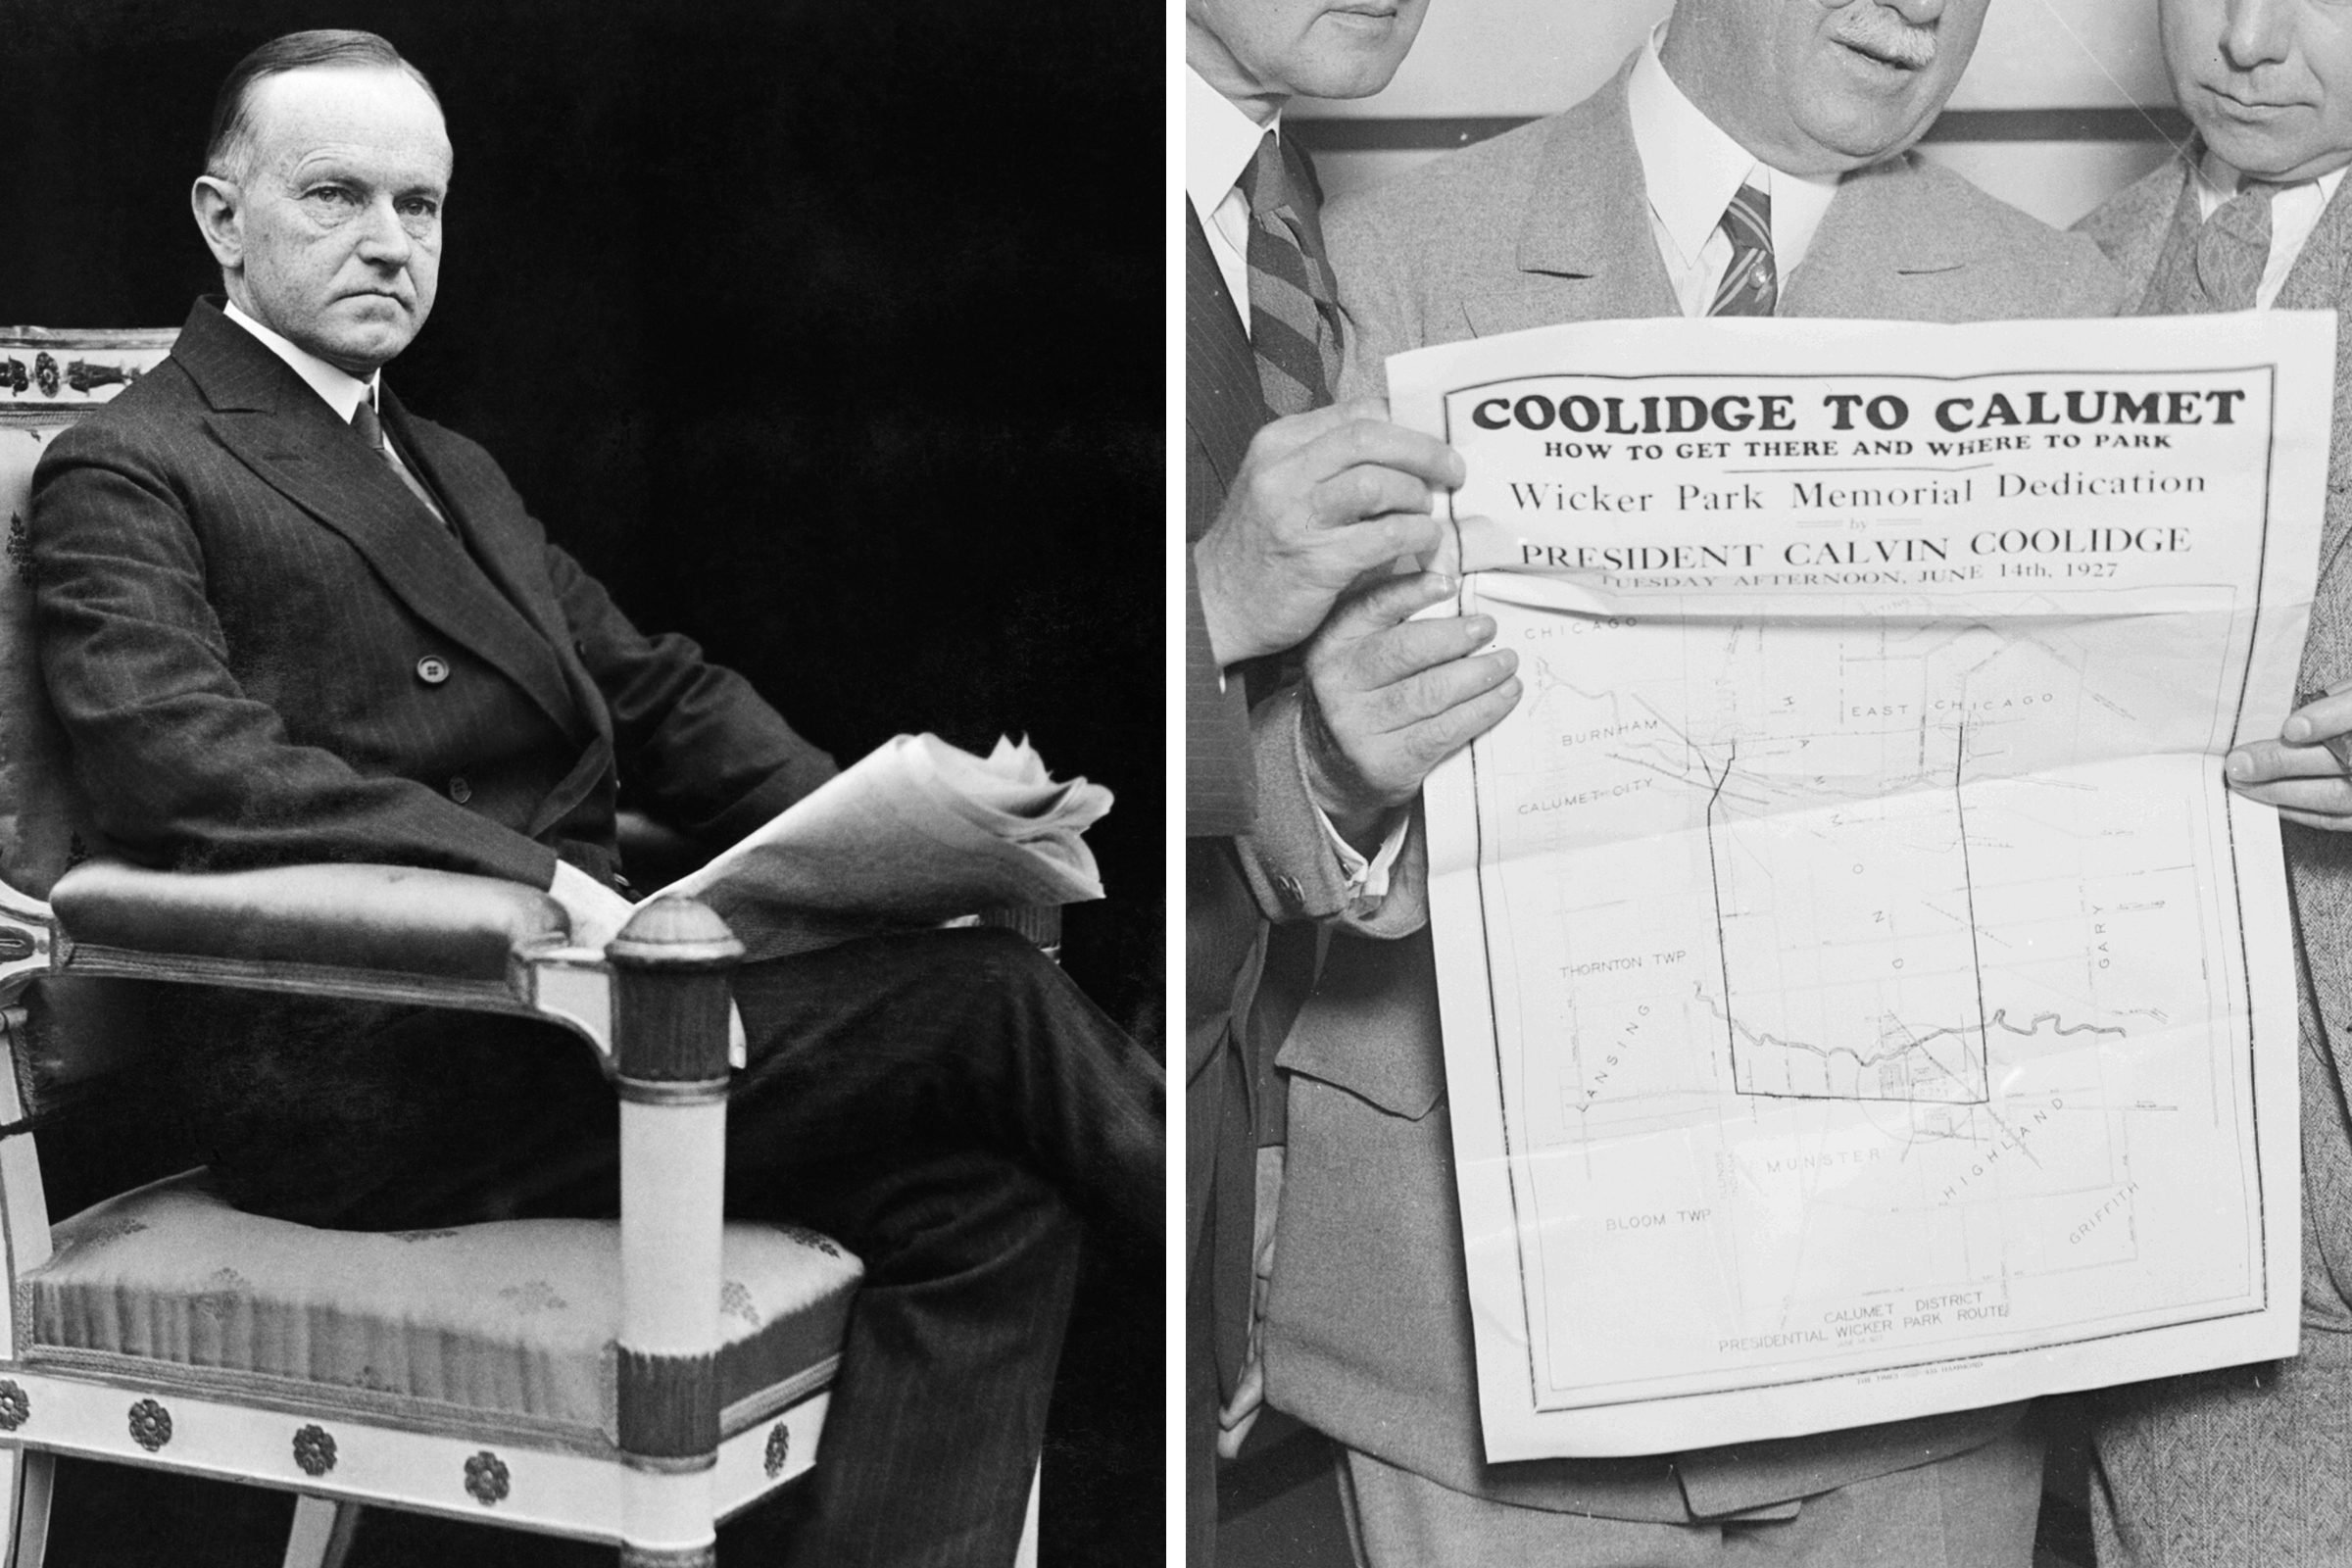 Calvin Coolidge: Newspaper columnist